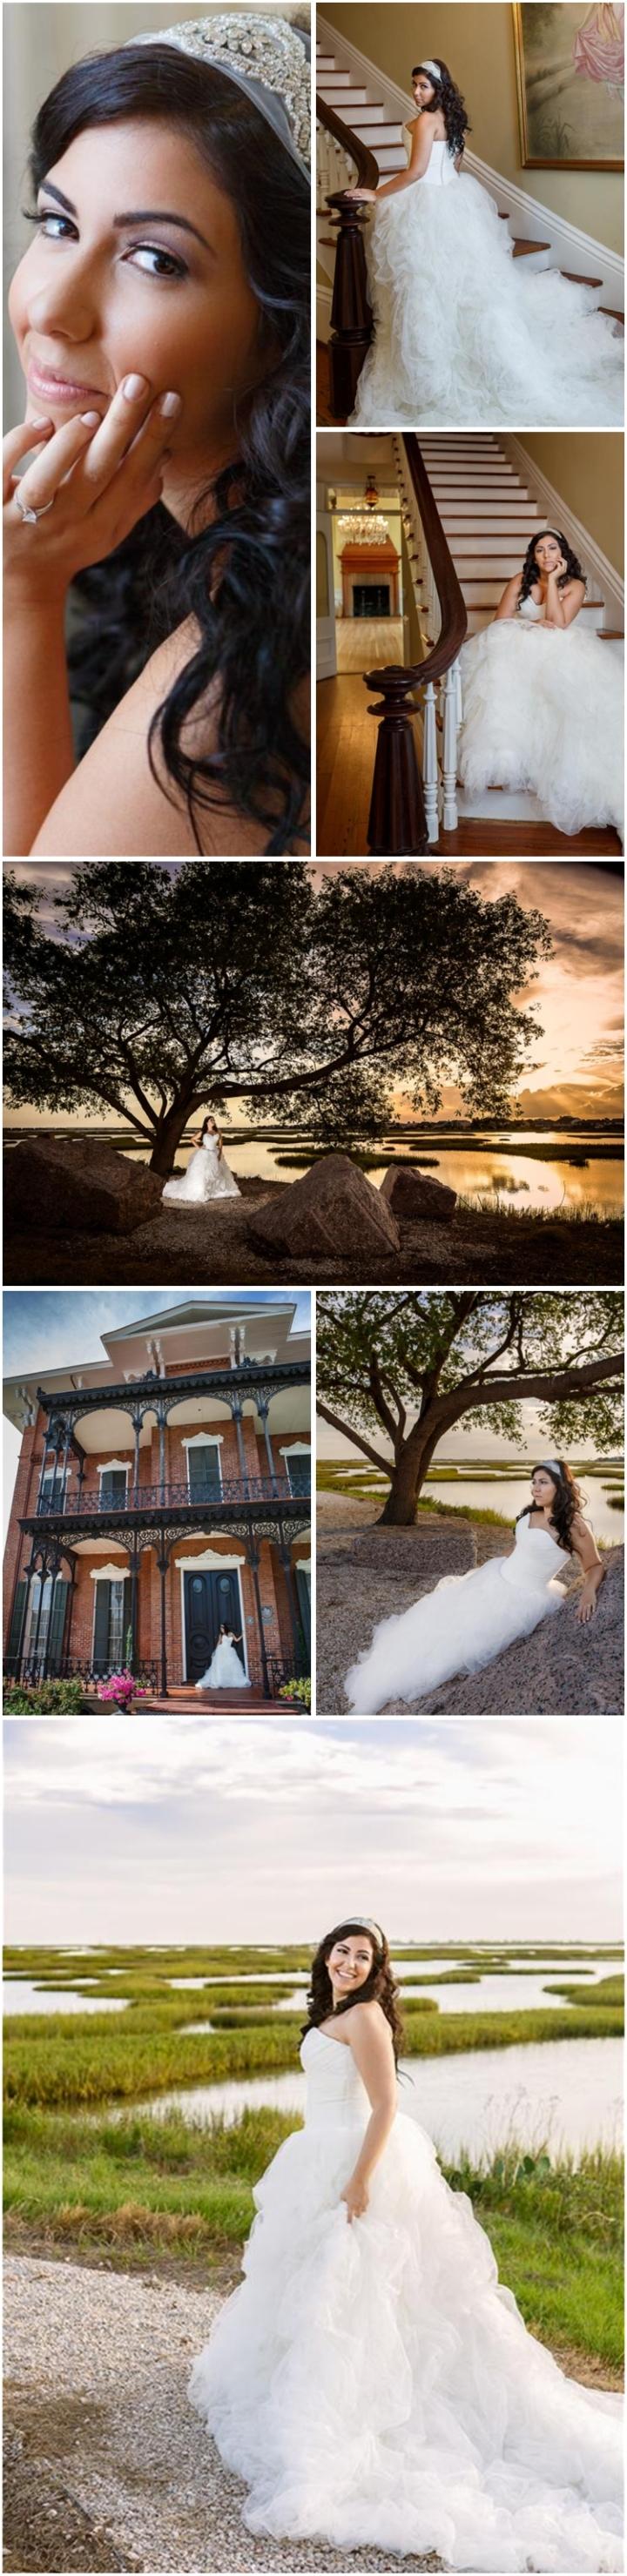 Galveston Wedding Photographer, Houston Wedding, C Baron PHotography, Ashton Villa, Beach, Outdoors, Sunset, Justin Alexander